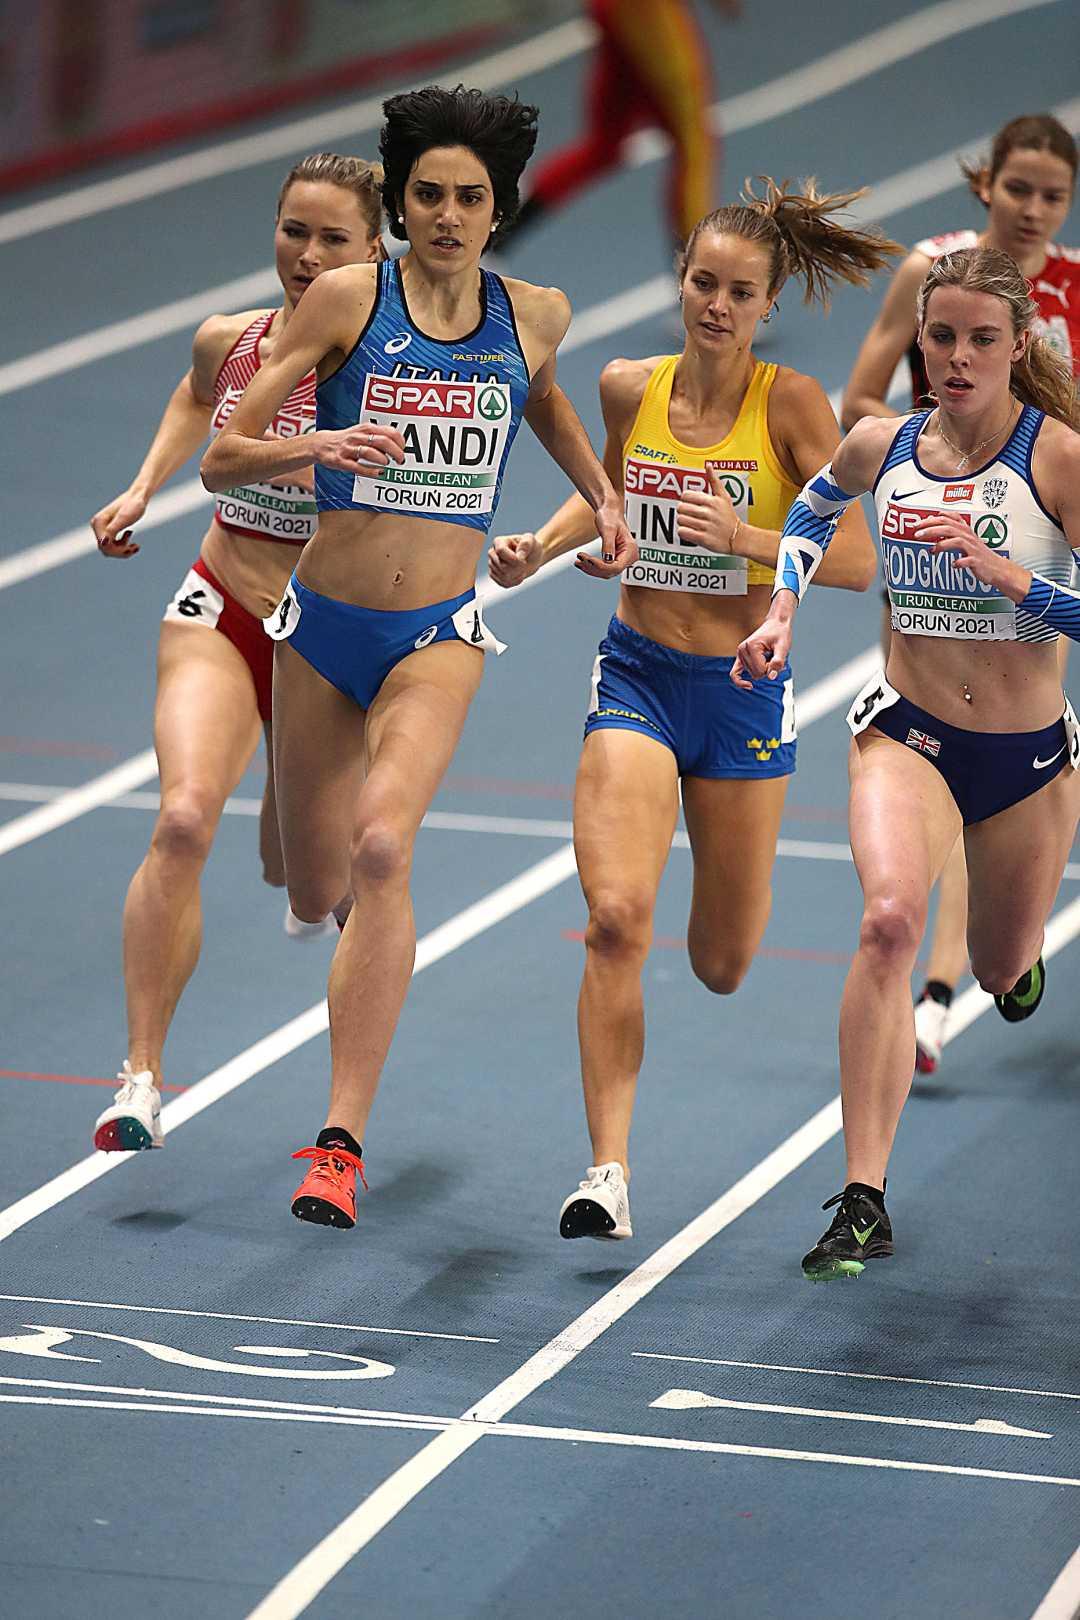 Atletica, Europei indoor: Barontini e Vandi out in semifinale